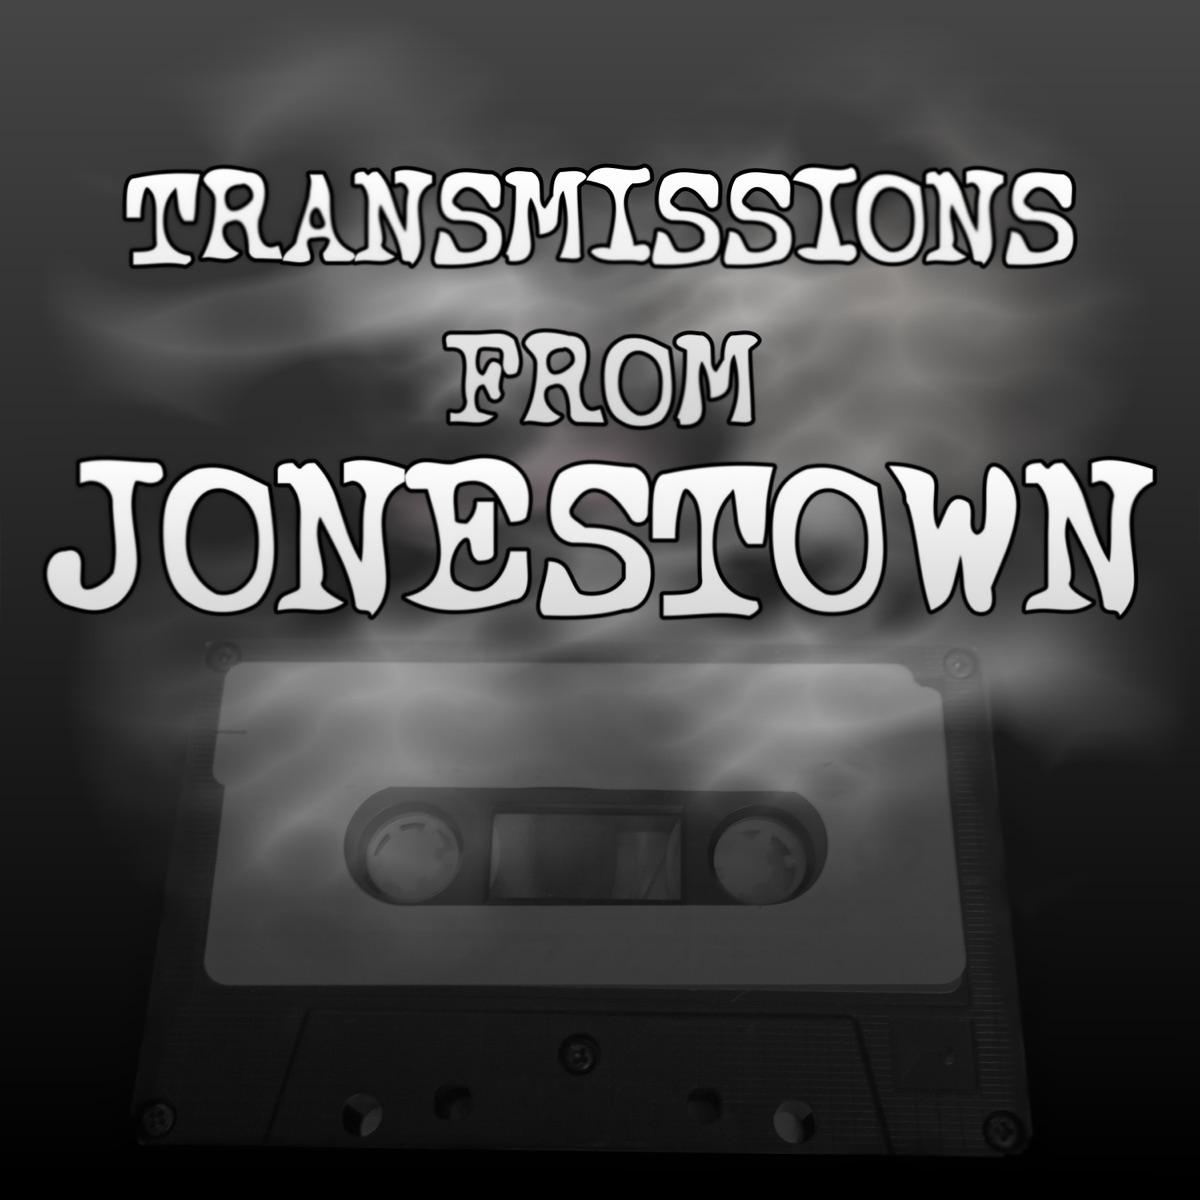 Transmissions From Jonestown